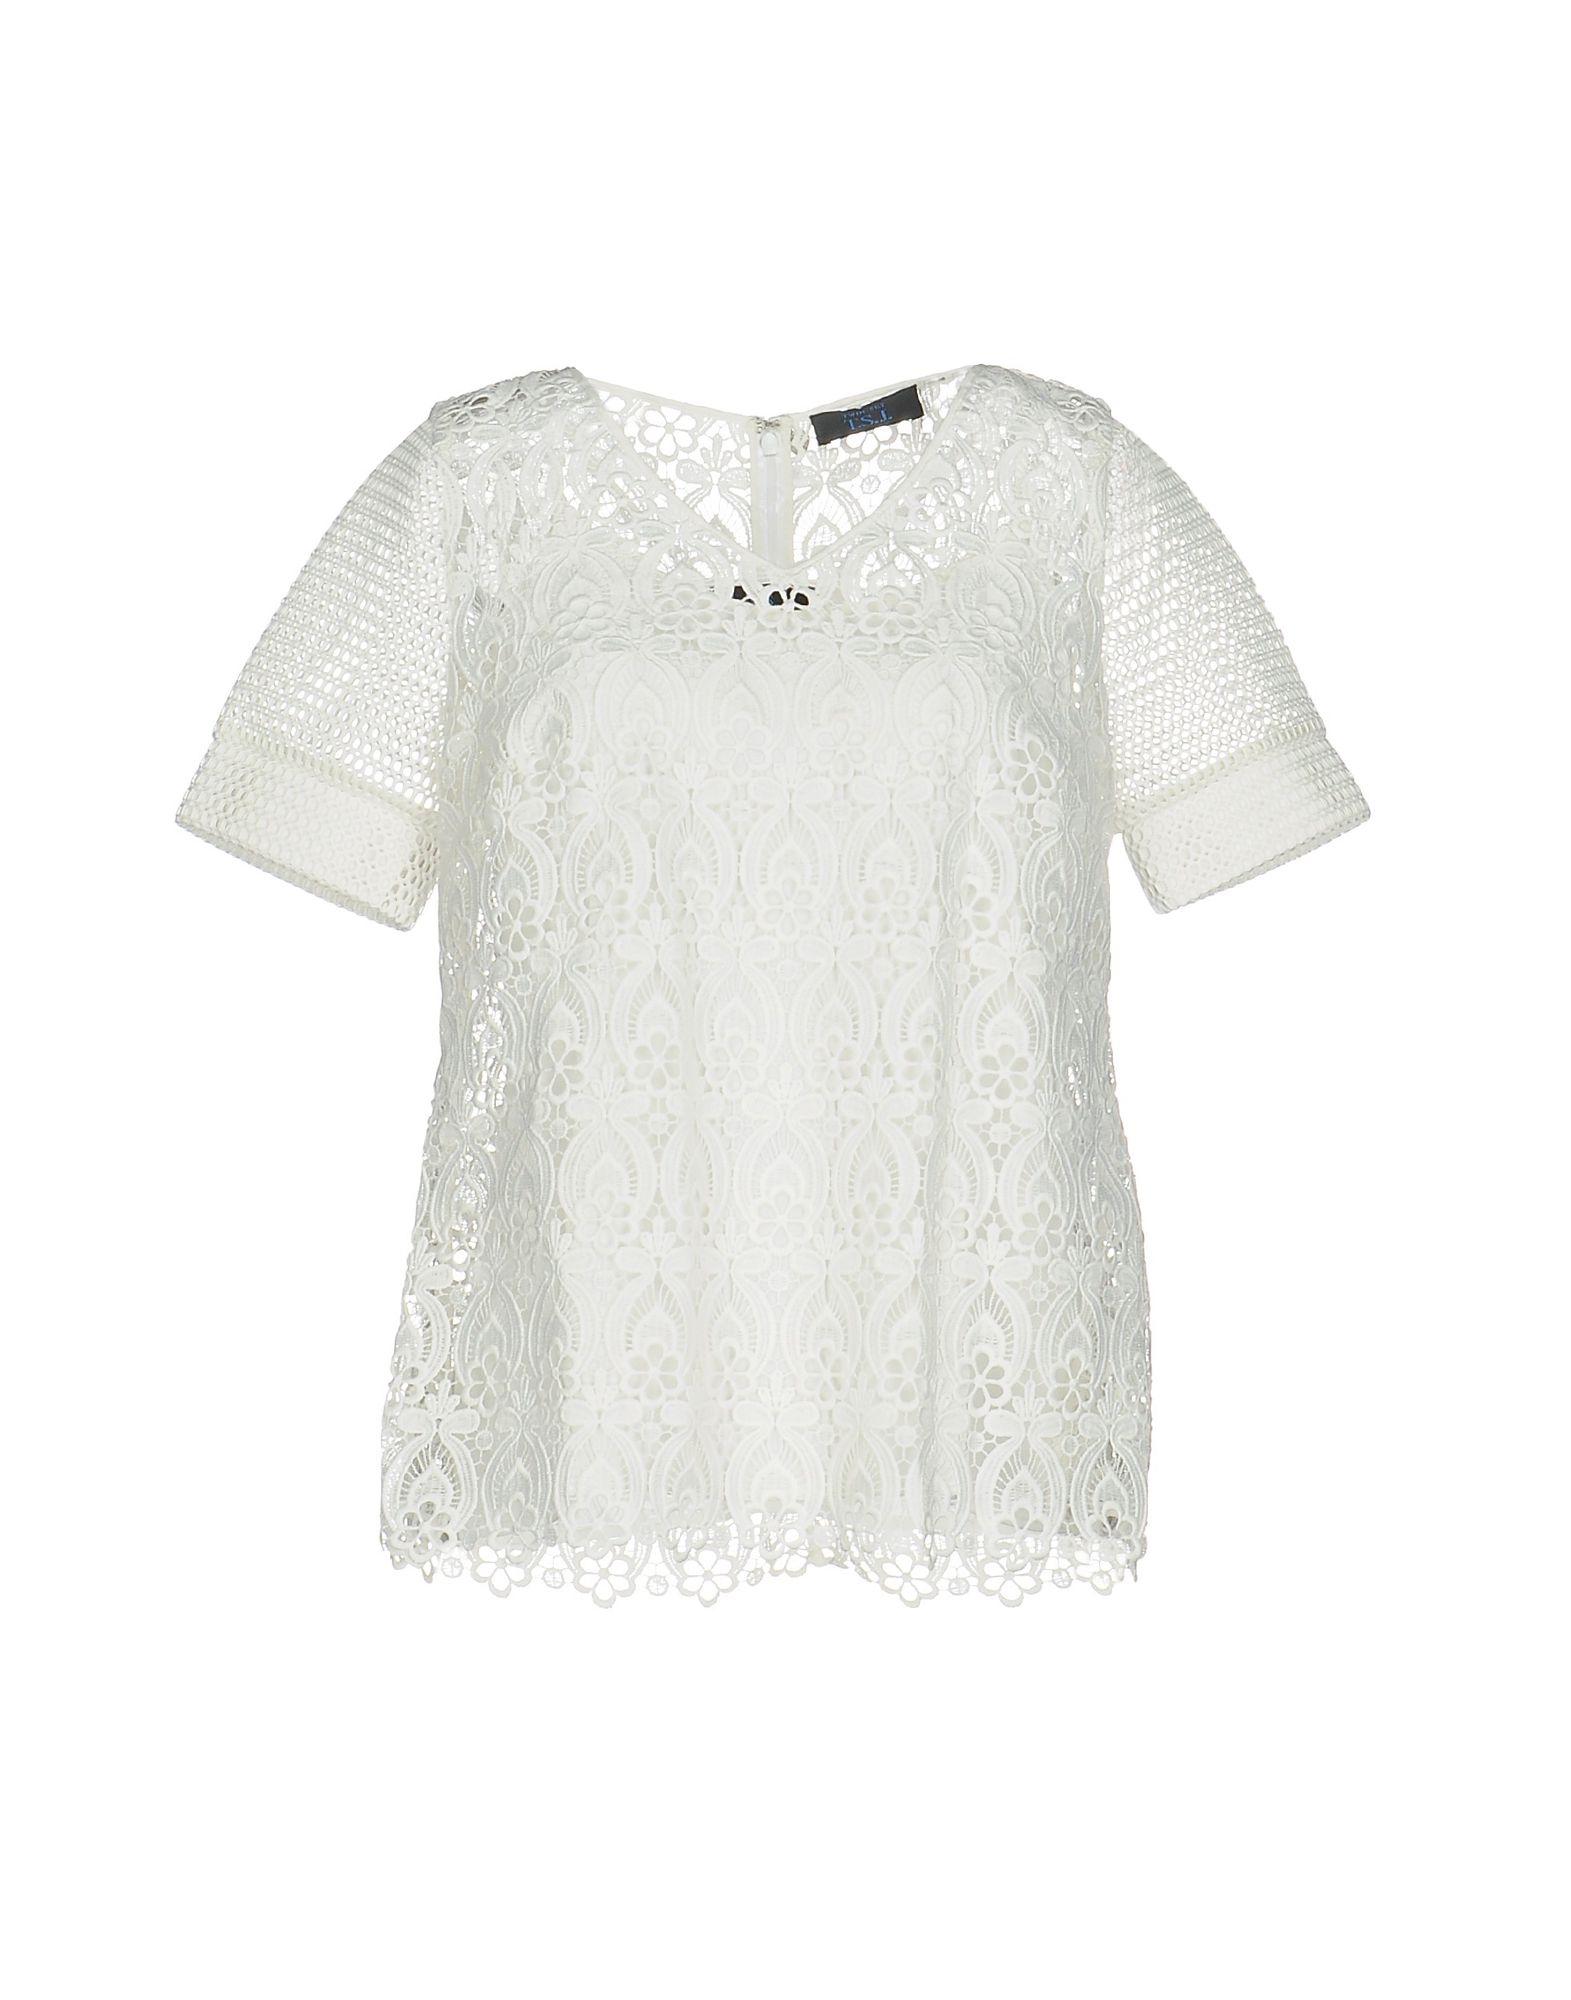 TWIN-SET JEANS Блузка twin set блузка комплект twin set p29270 2buy серый l